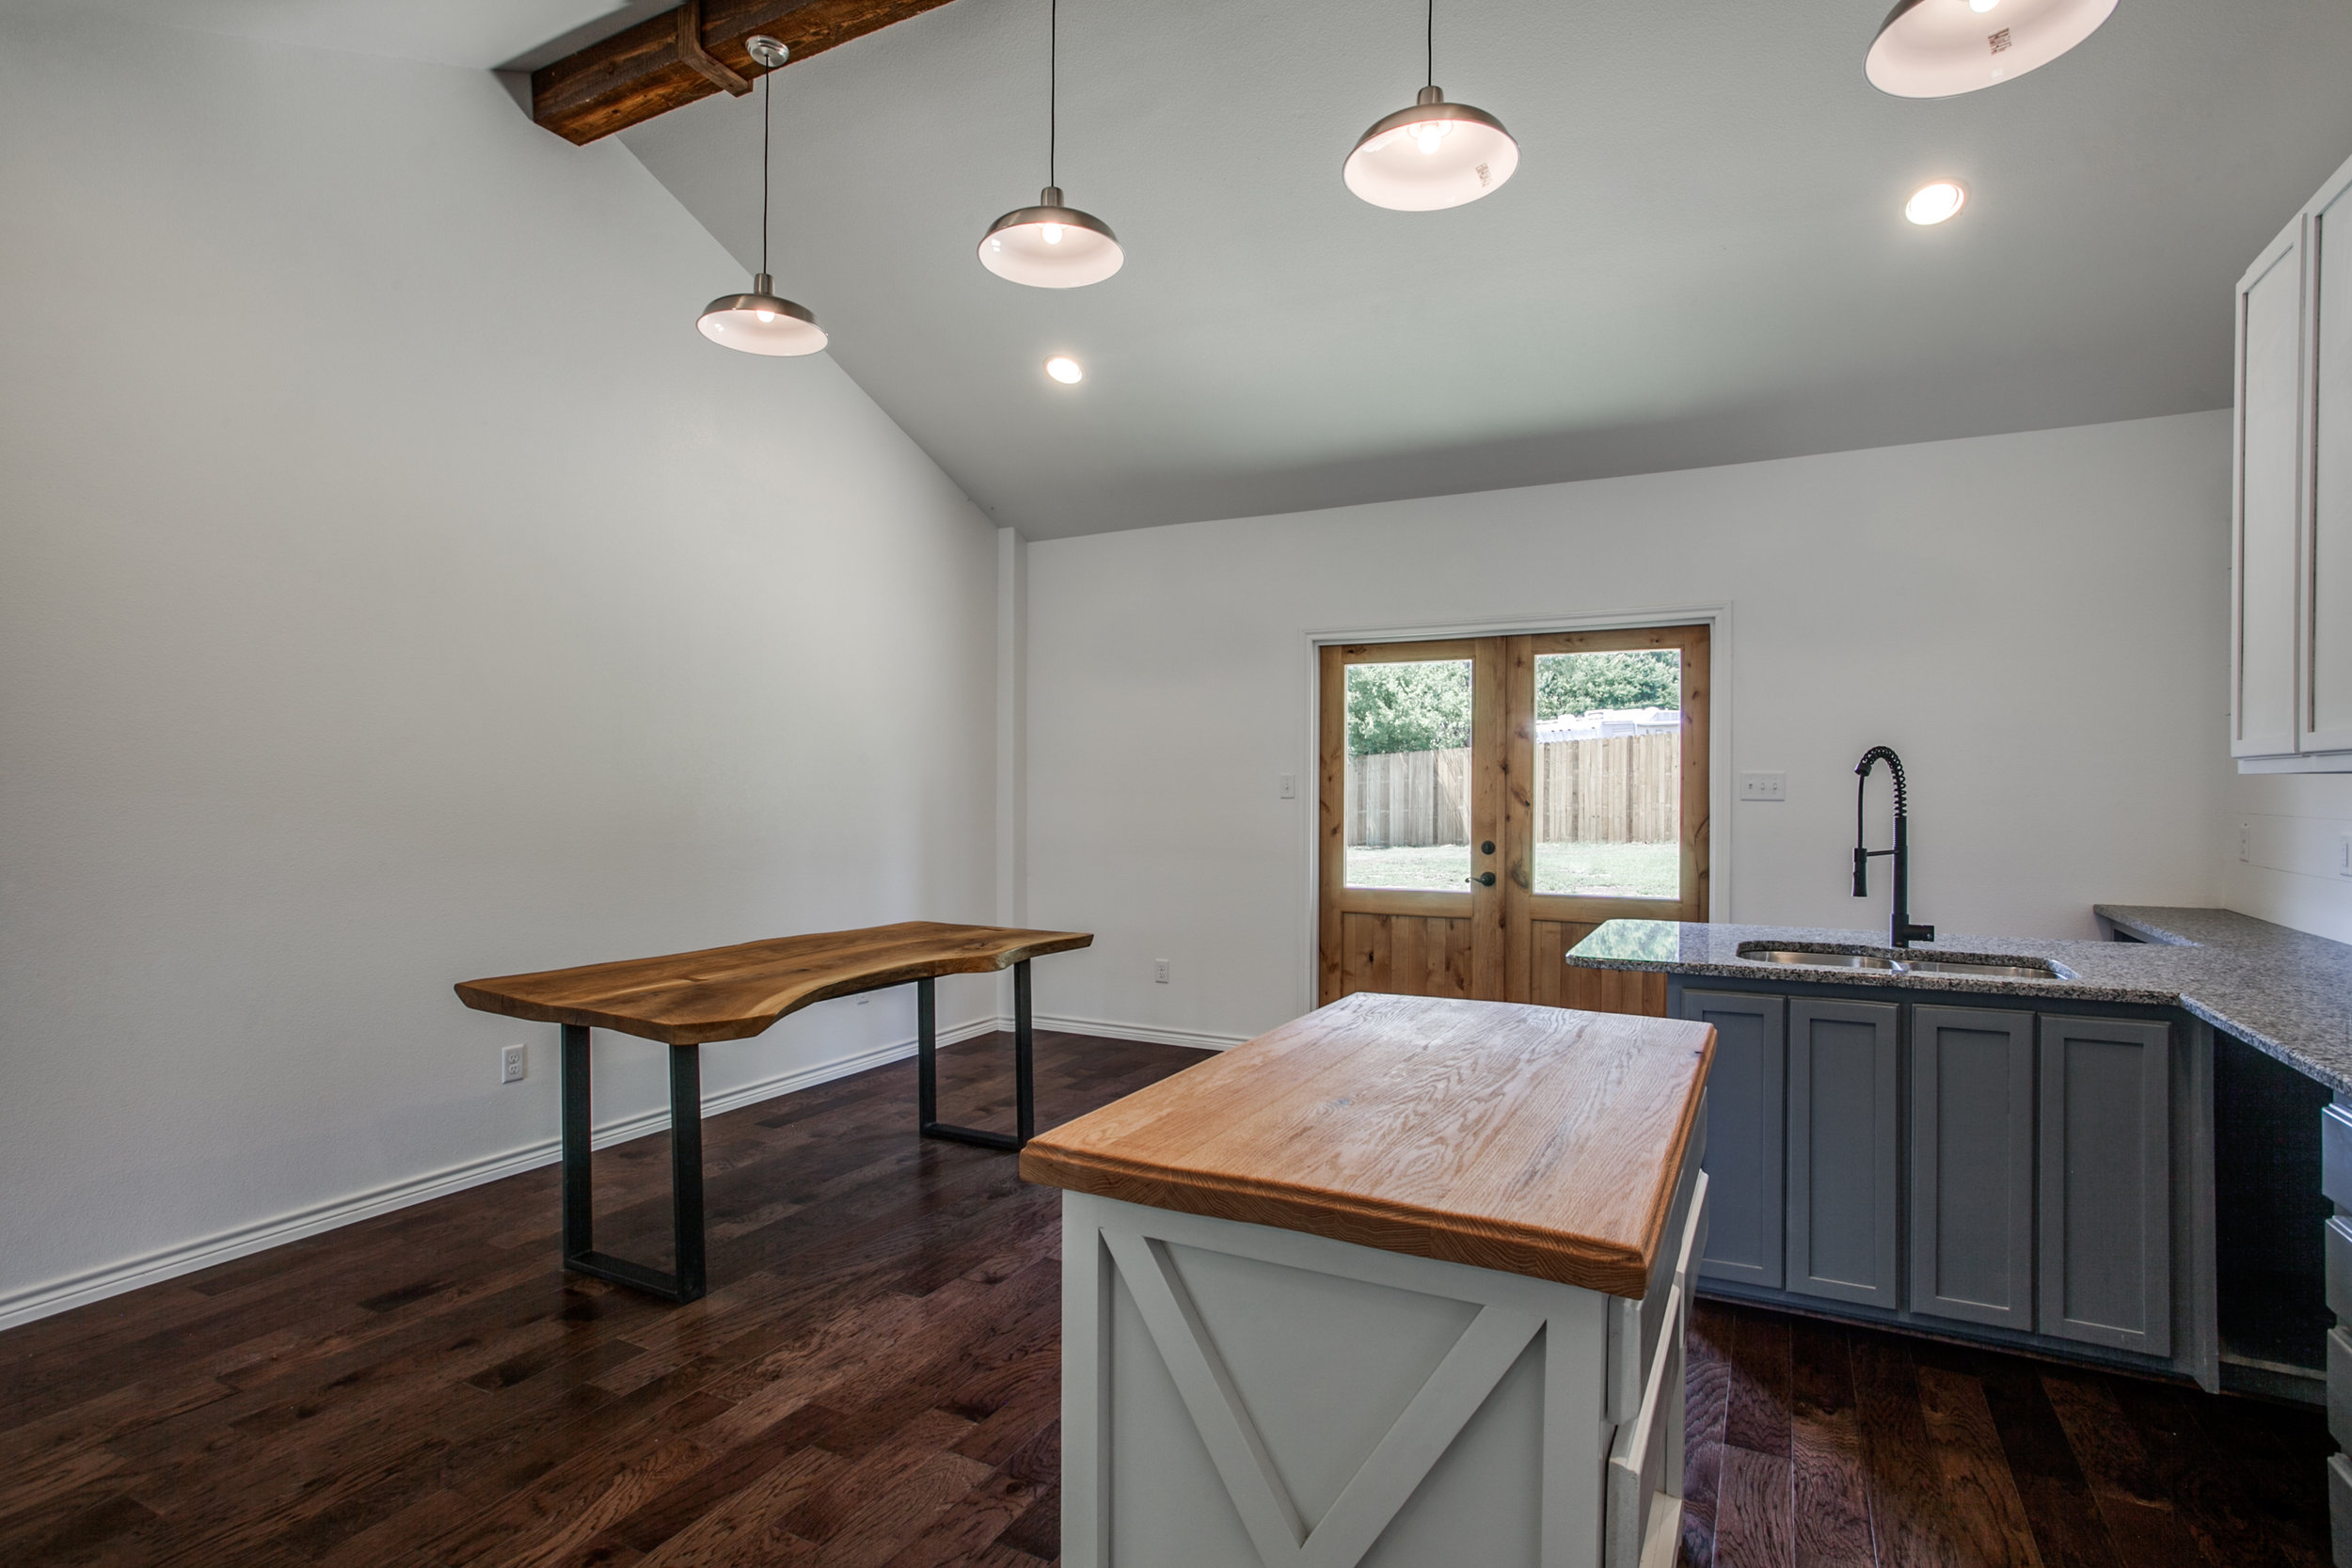 Furniture - Live edge wood table - solid oakButcher block Island